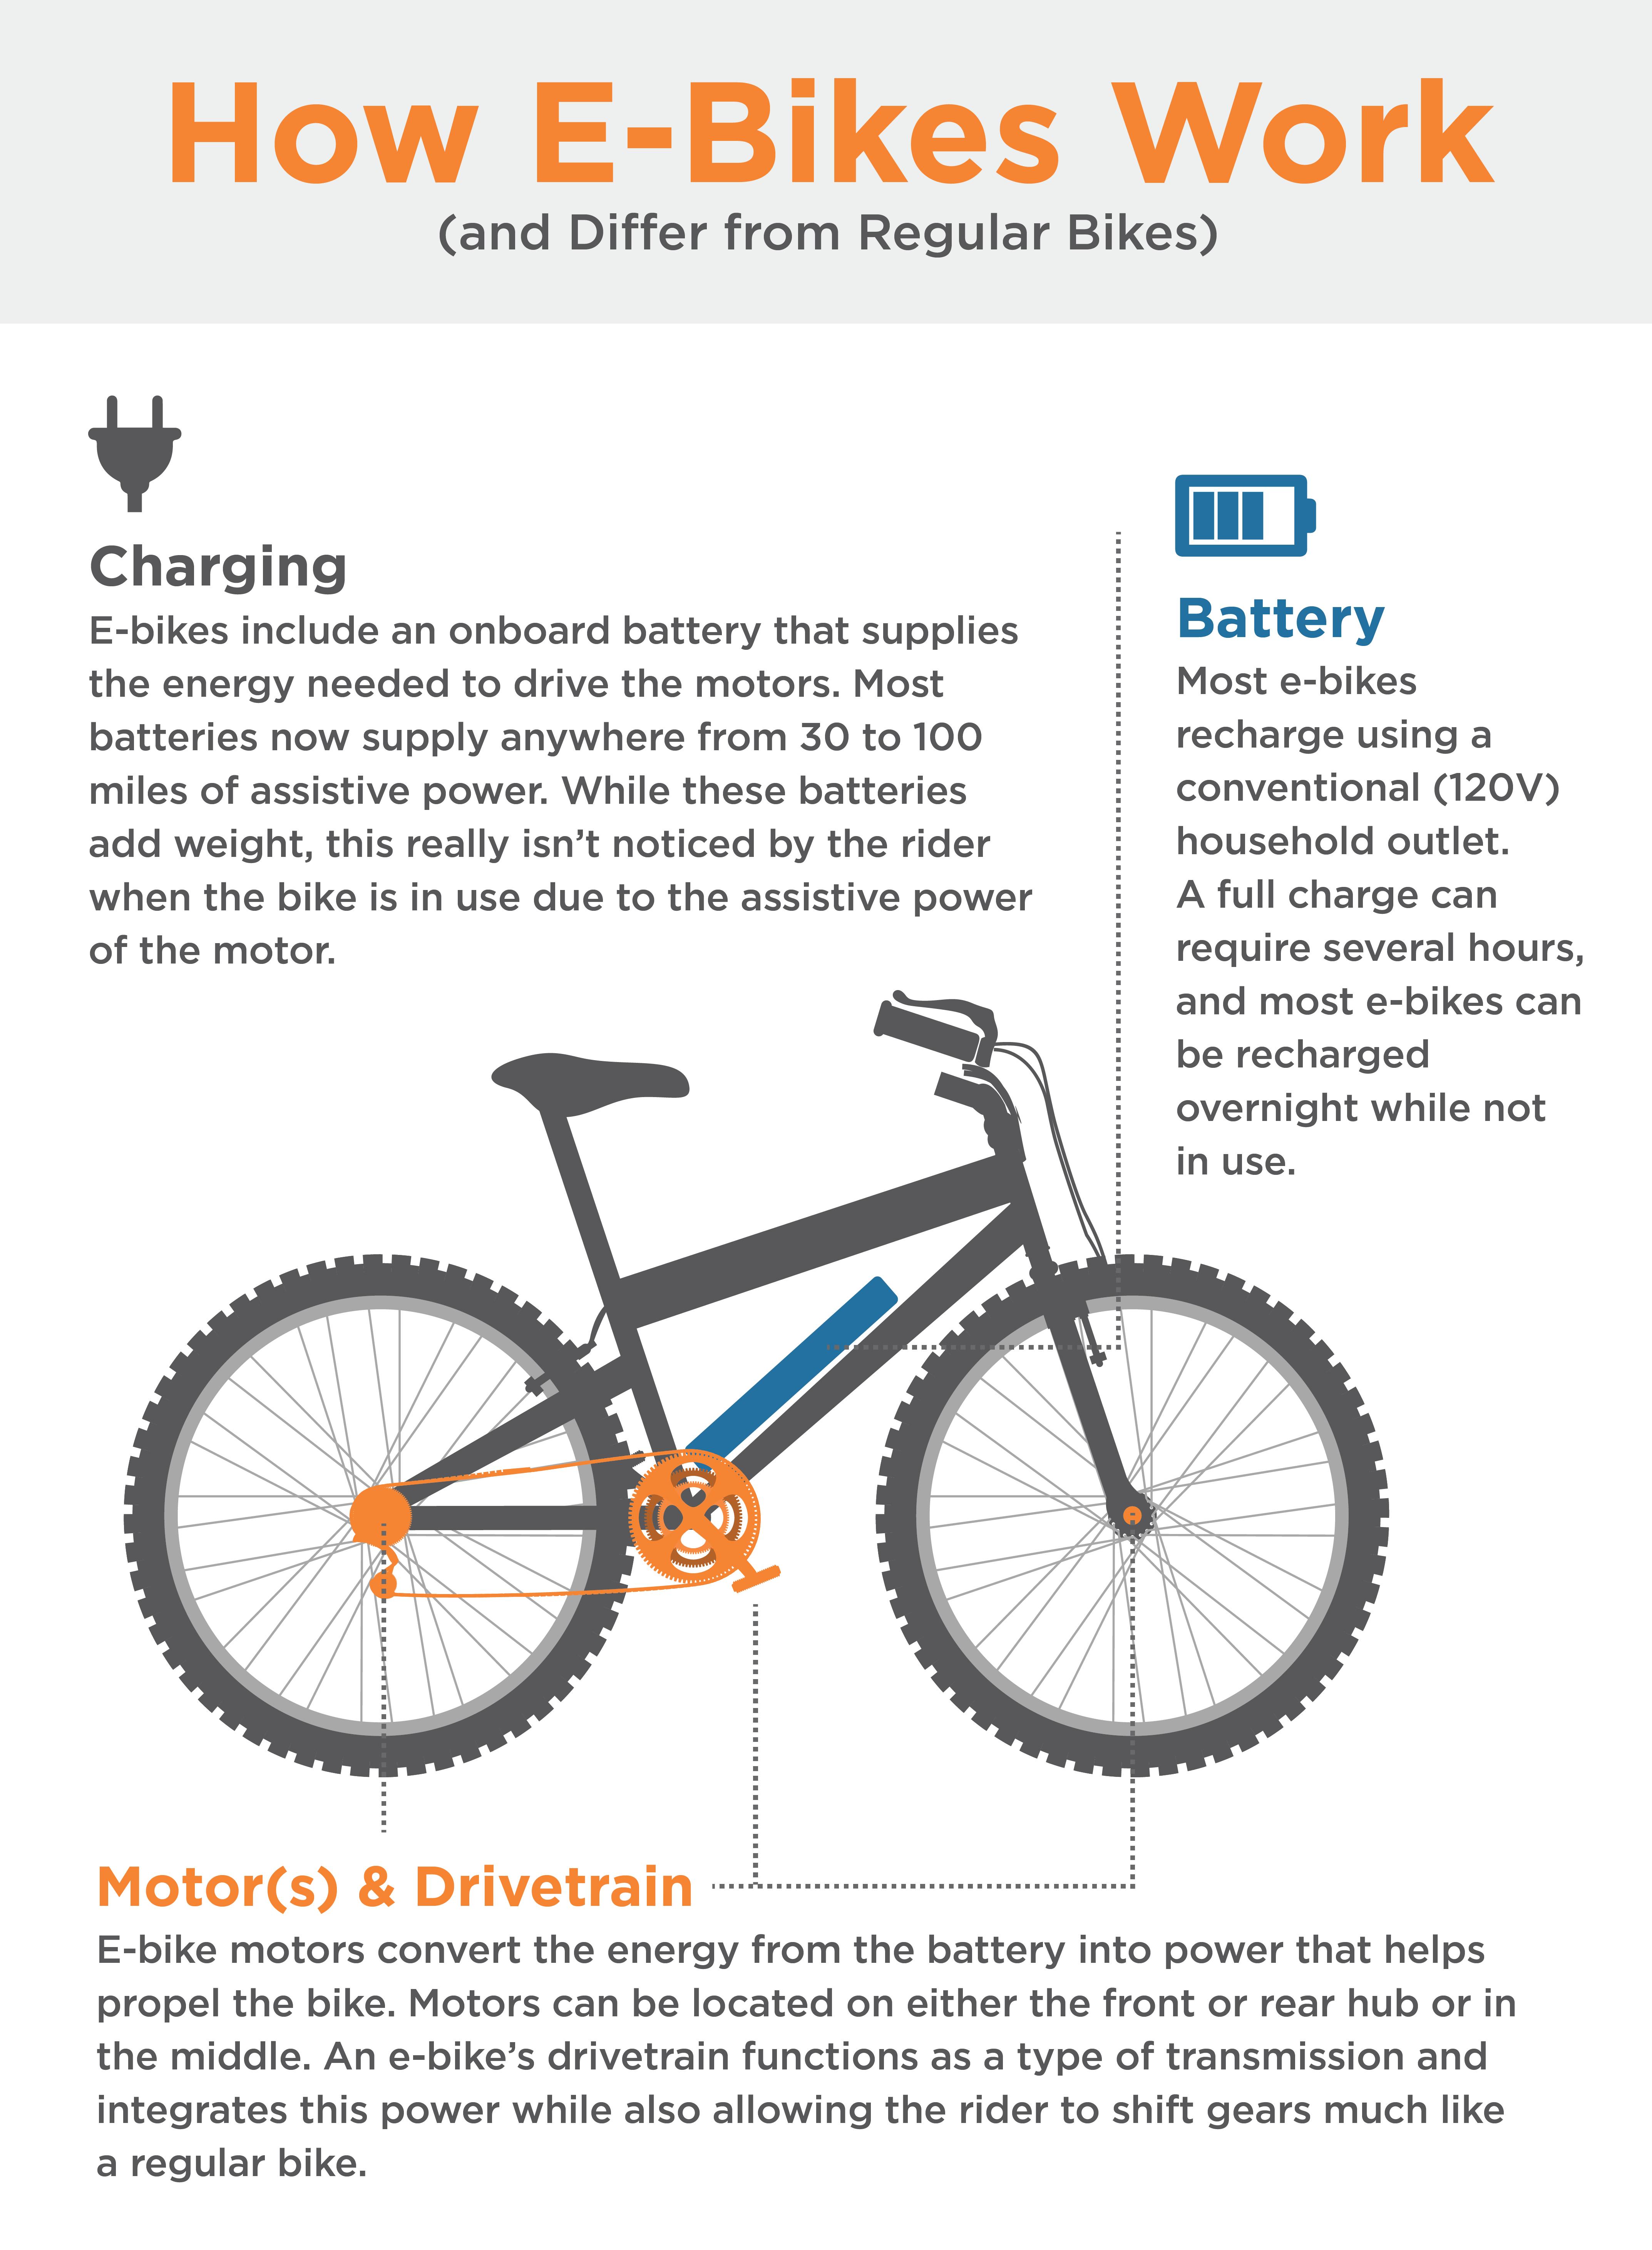 Infographic demonstrating how e-bikes work